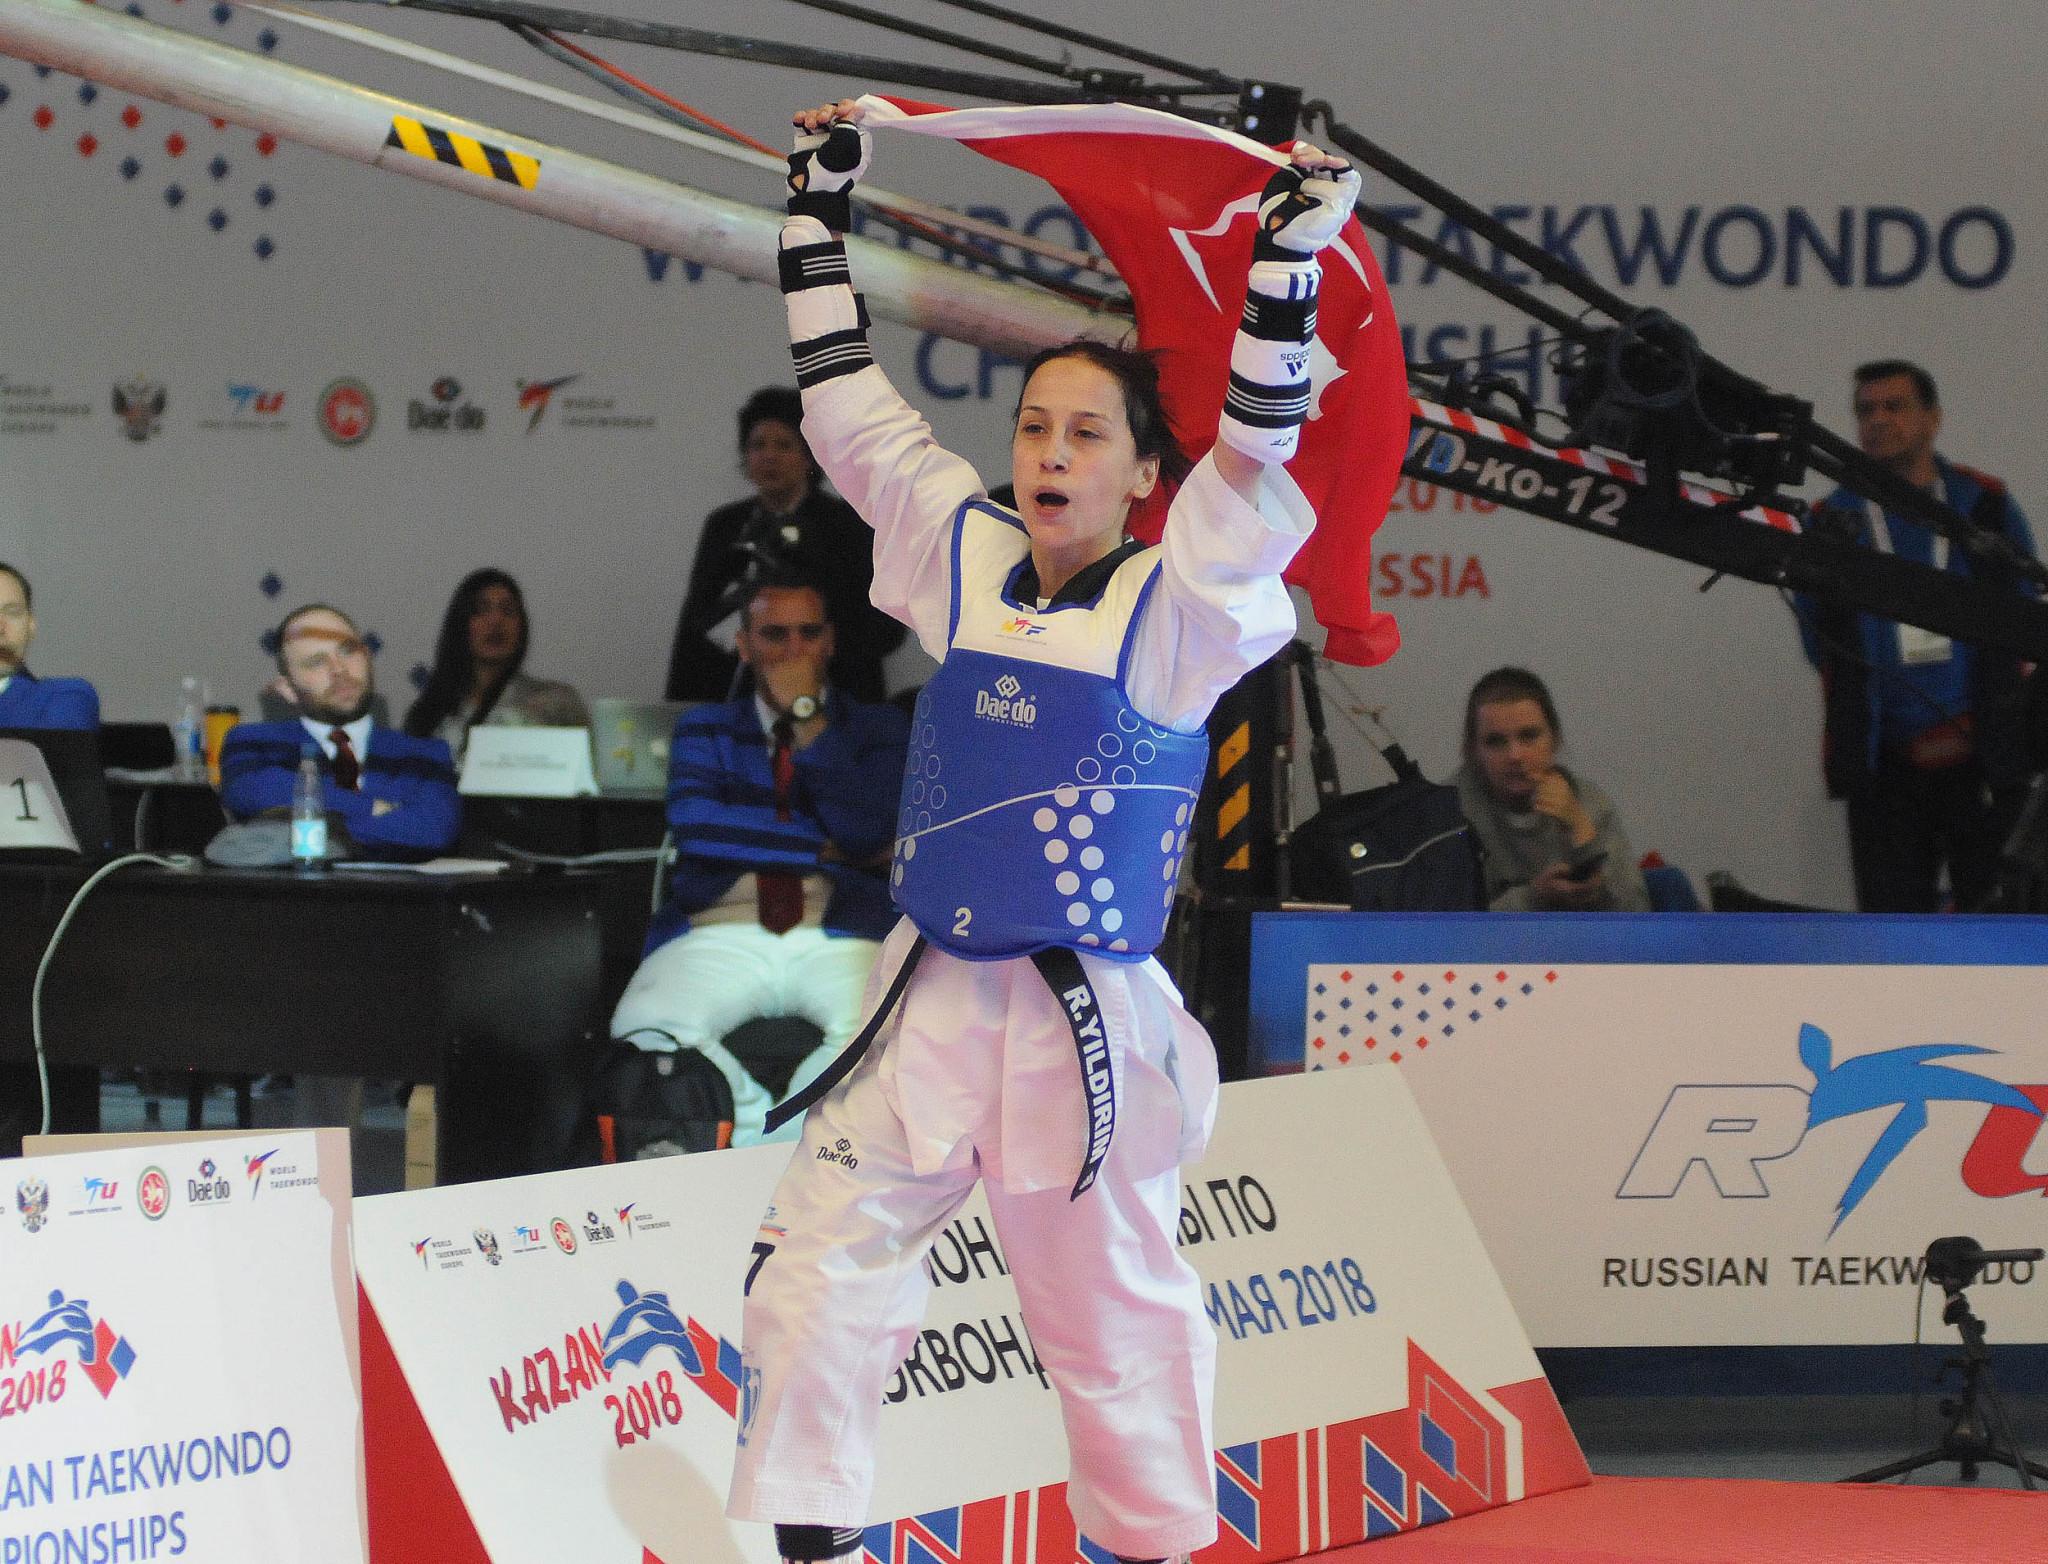 Turkey's Rukiye Yildirim claimed the women's under-46 kilograms gold medal on the opening day of the European Taekwondo Championships in Kazan ©World Taekwondo Europe/Murat Tarhan